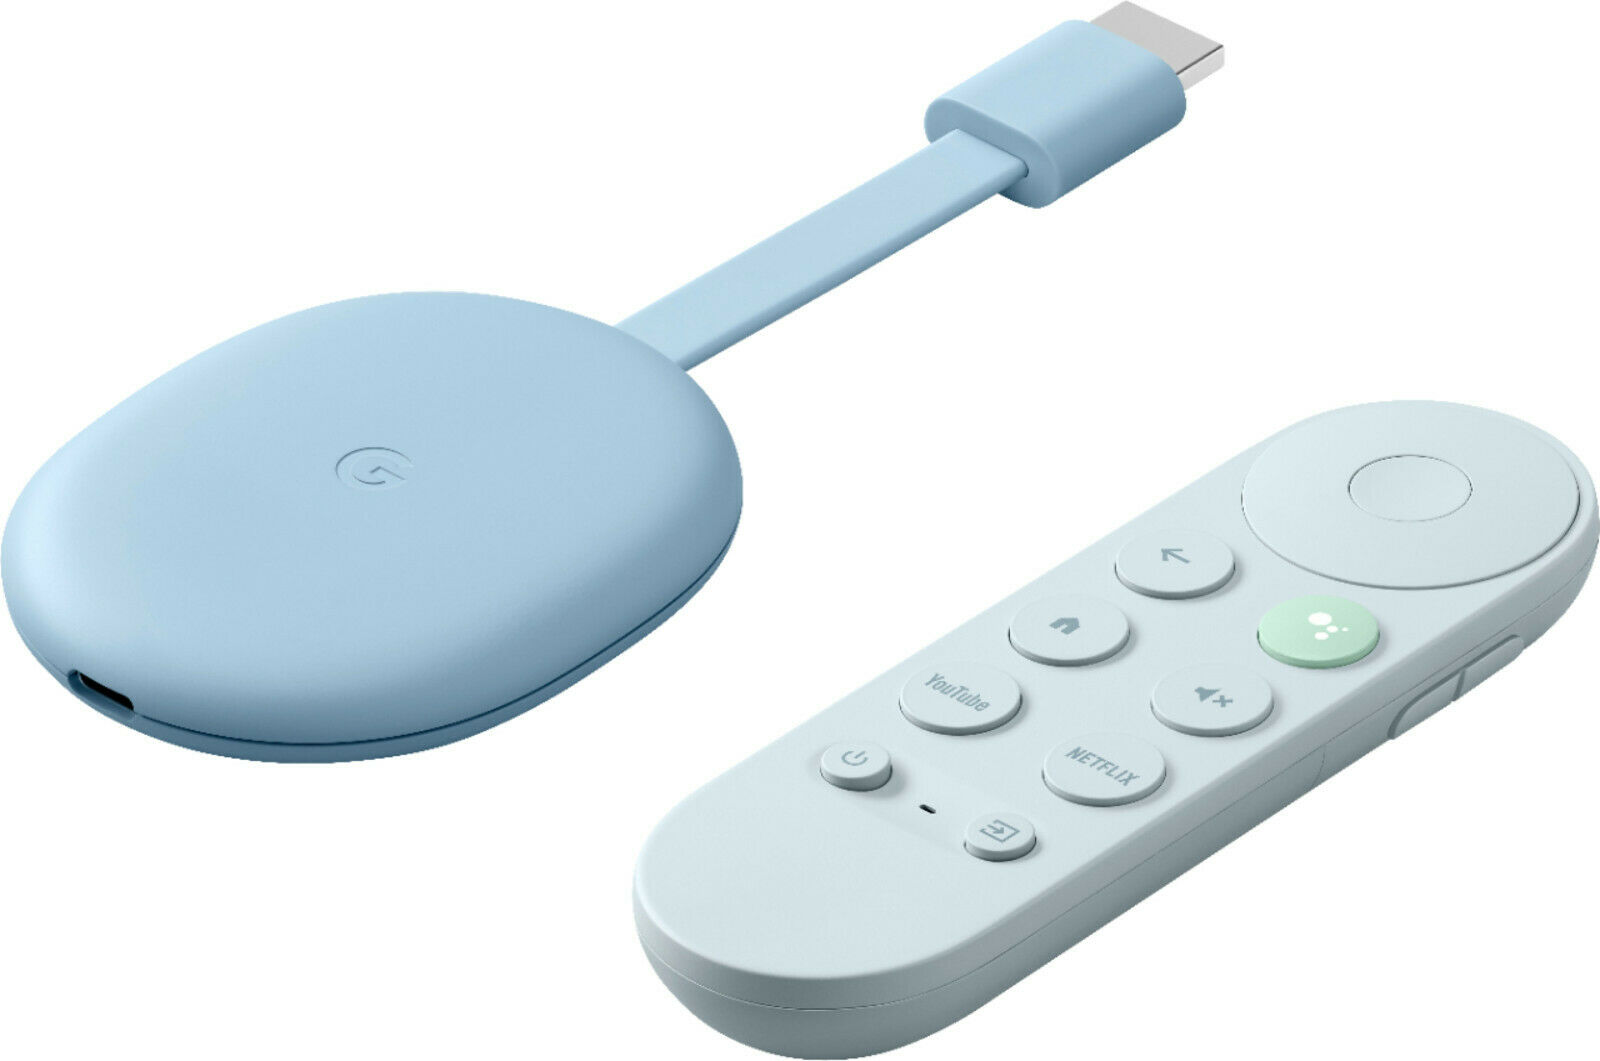 Google Chromecast with Google TV 2020 - Streaming Media Player 4K HDR - Sky Blue blue chromecast google hdr media player sky streaming with